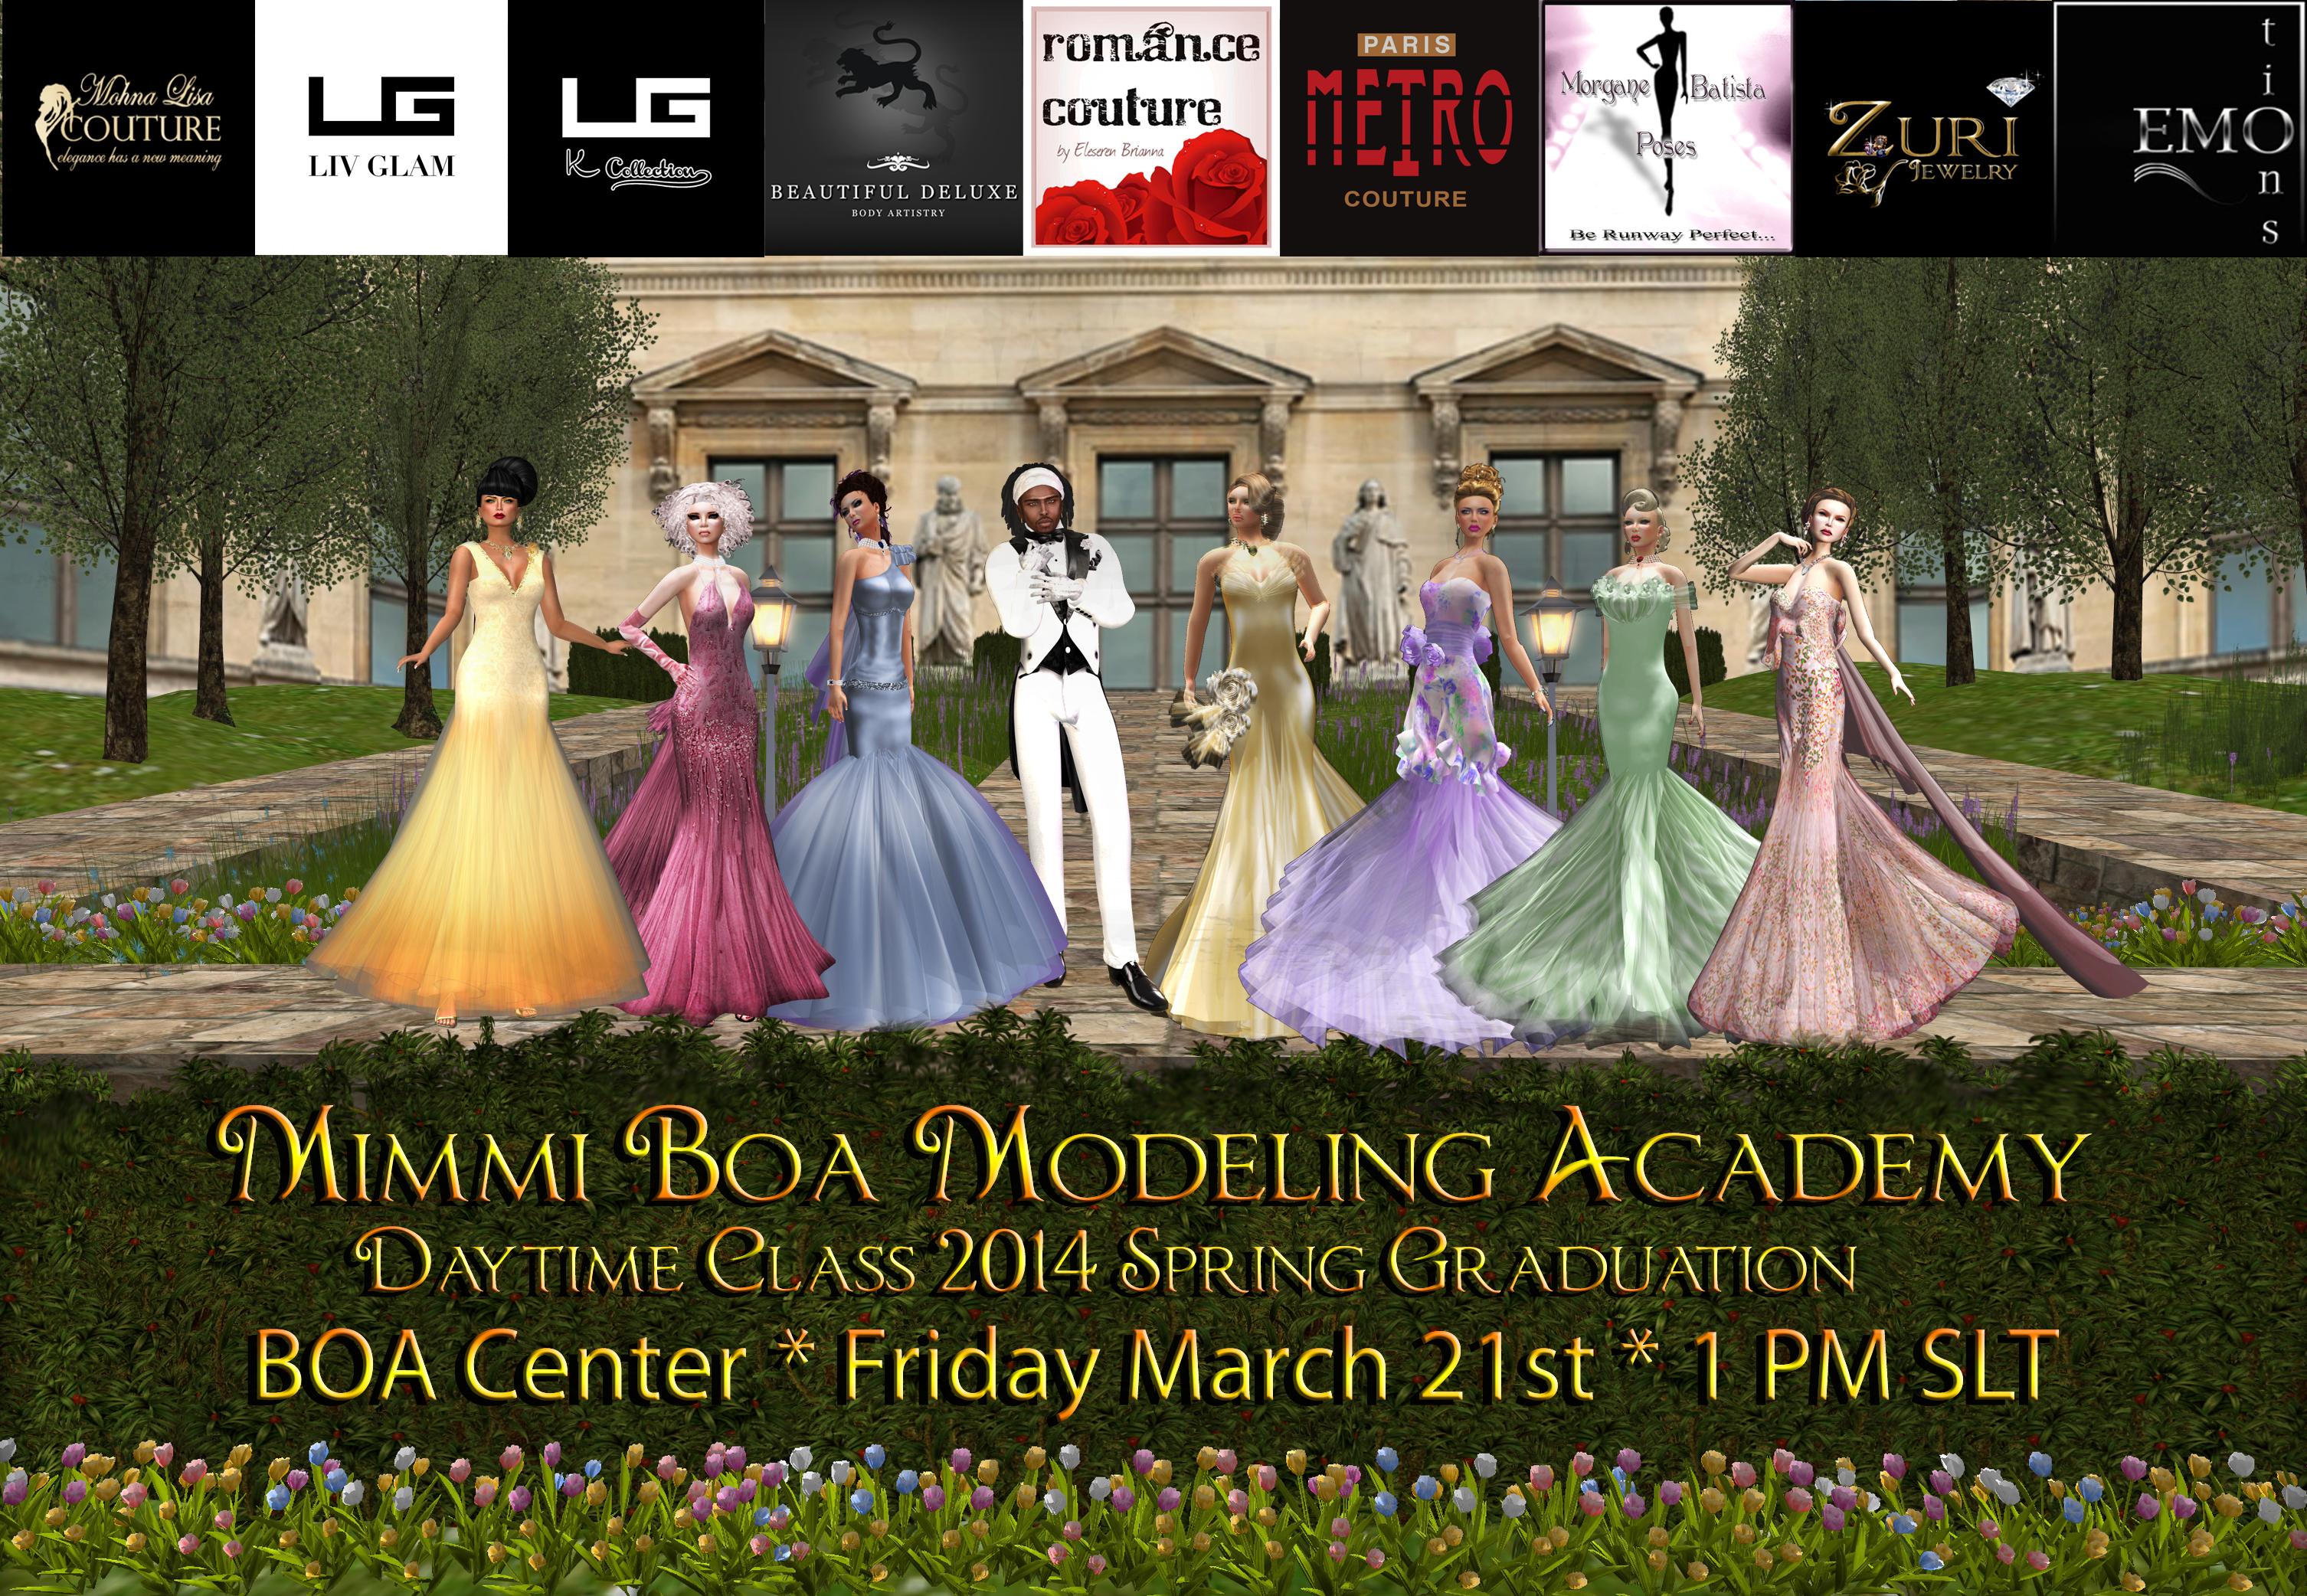 MBMA 2014 Spring Daytime Graduation Show Invitation